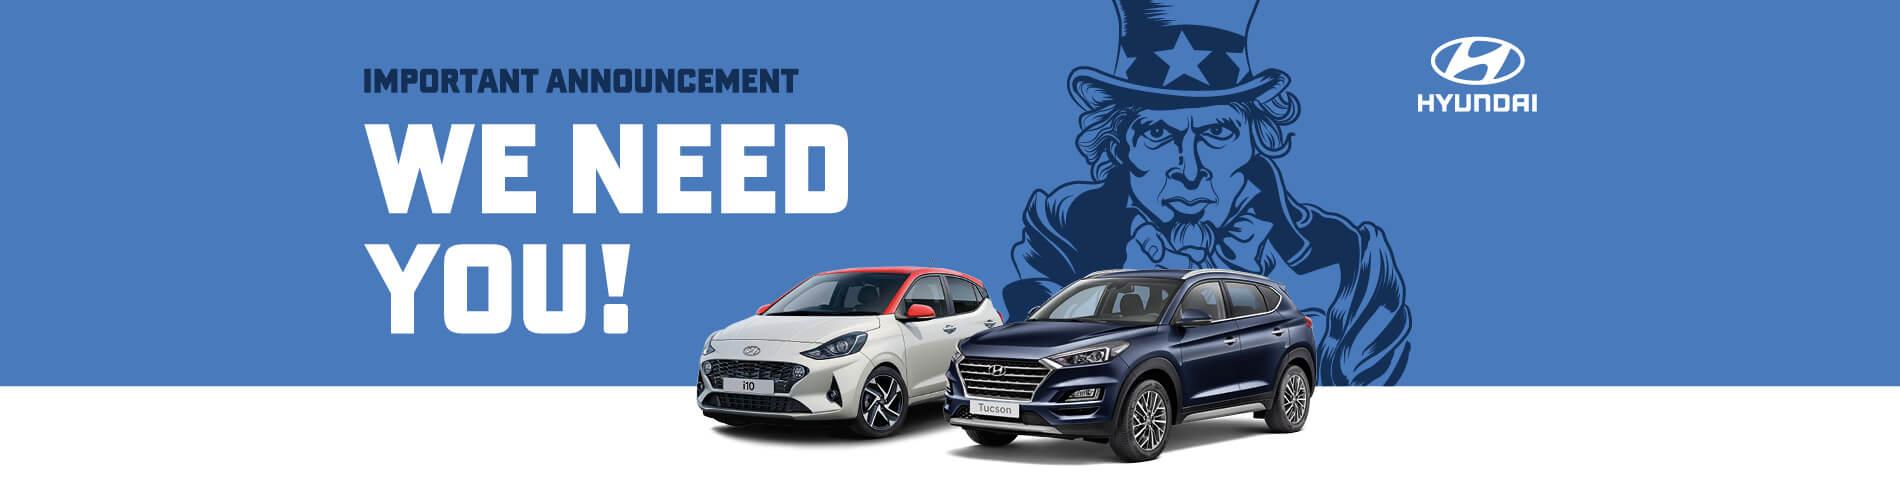 Hyundai We want your car